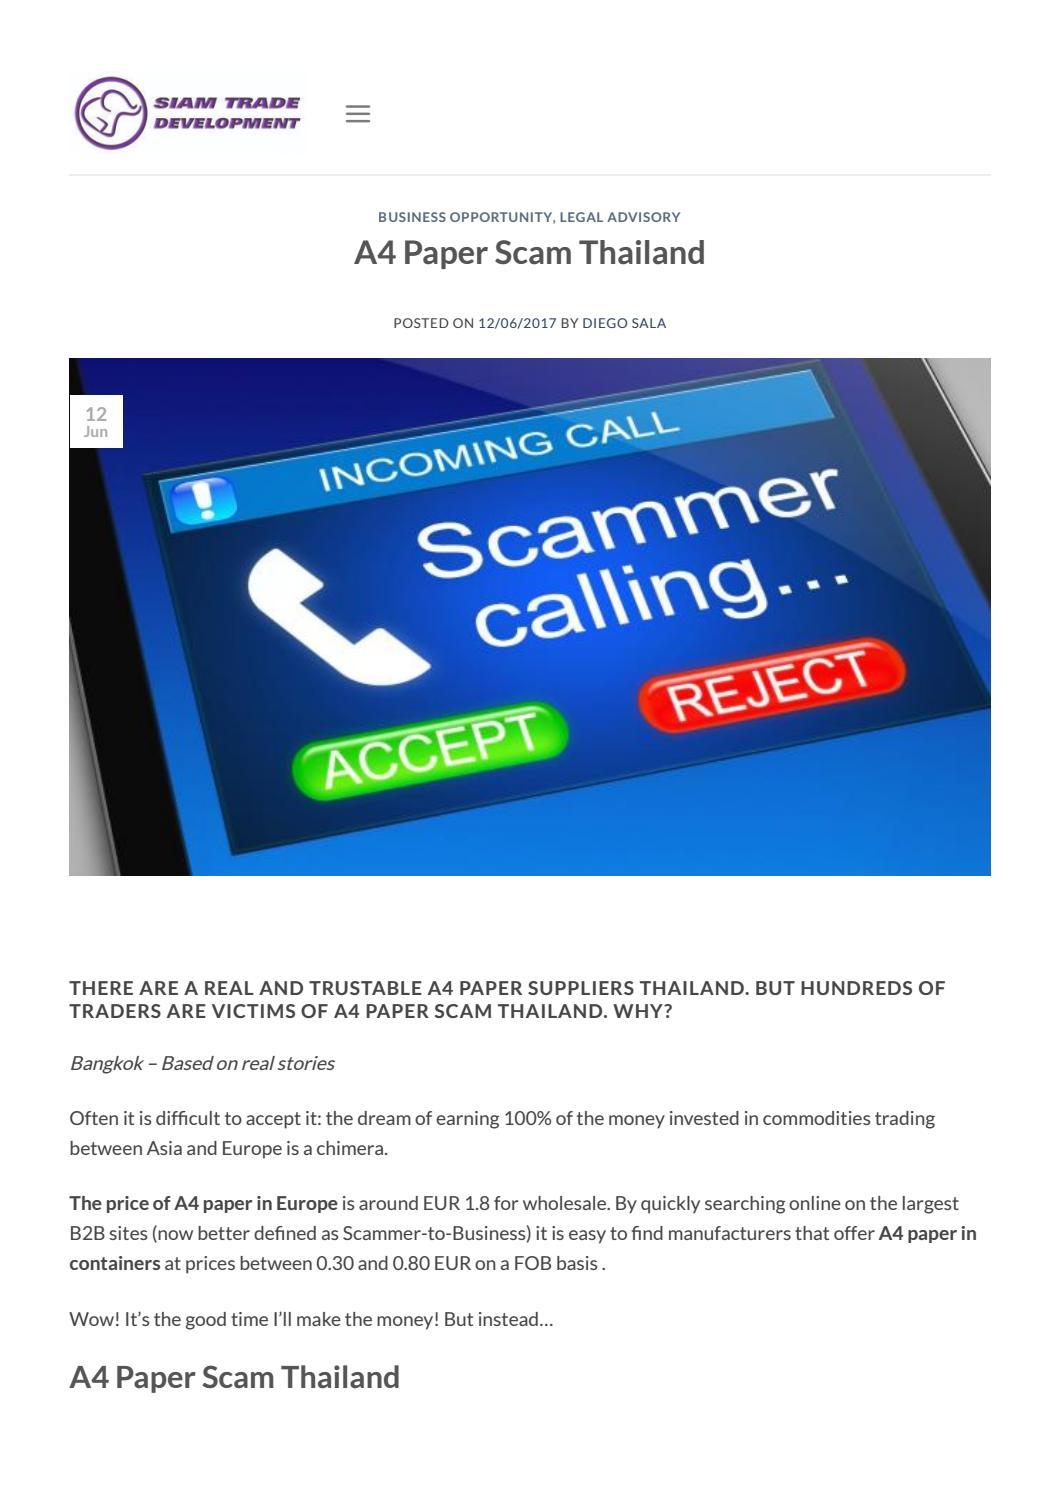 A4 paper scam thailand • siam trade development by Siam